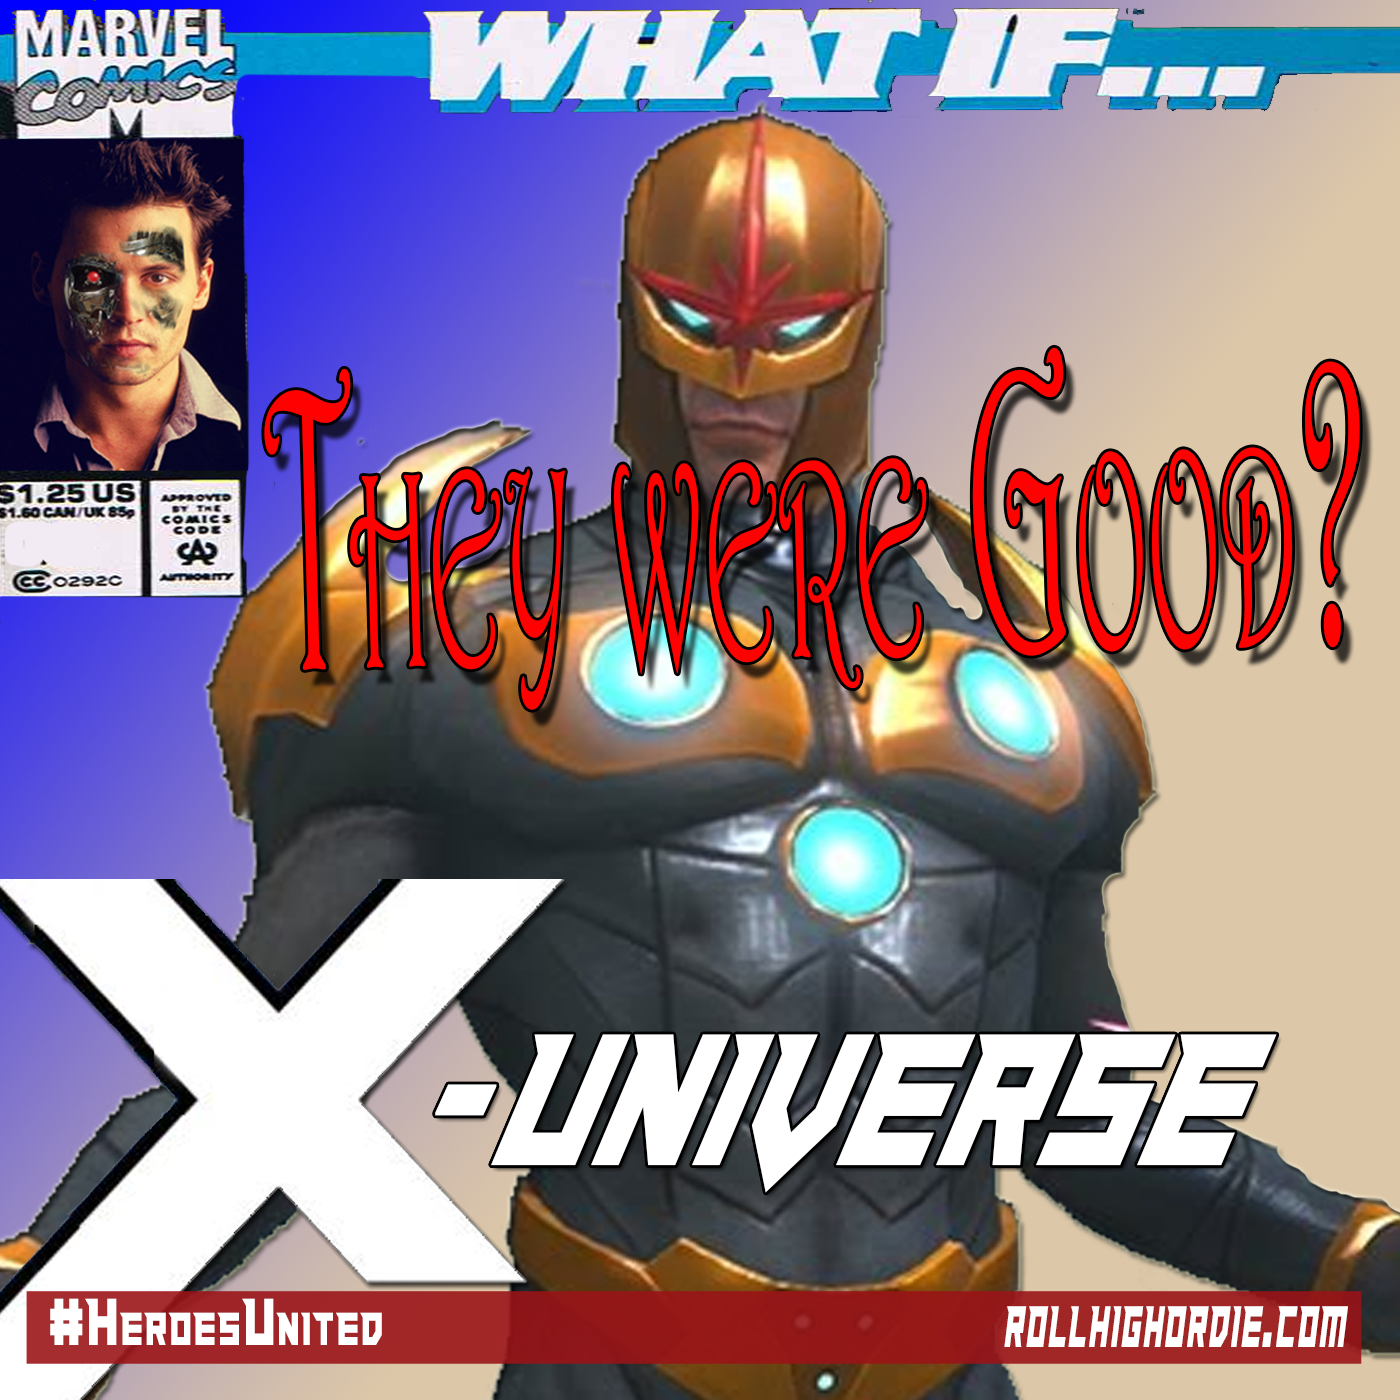 Marvel's X-Universe